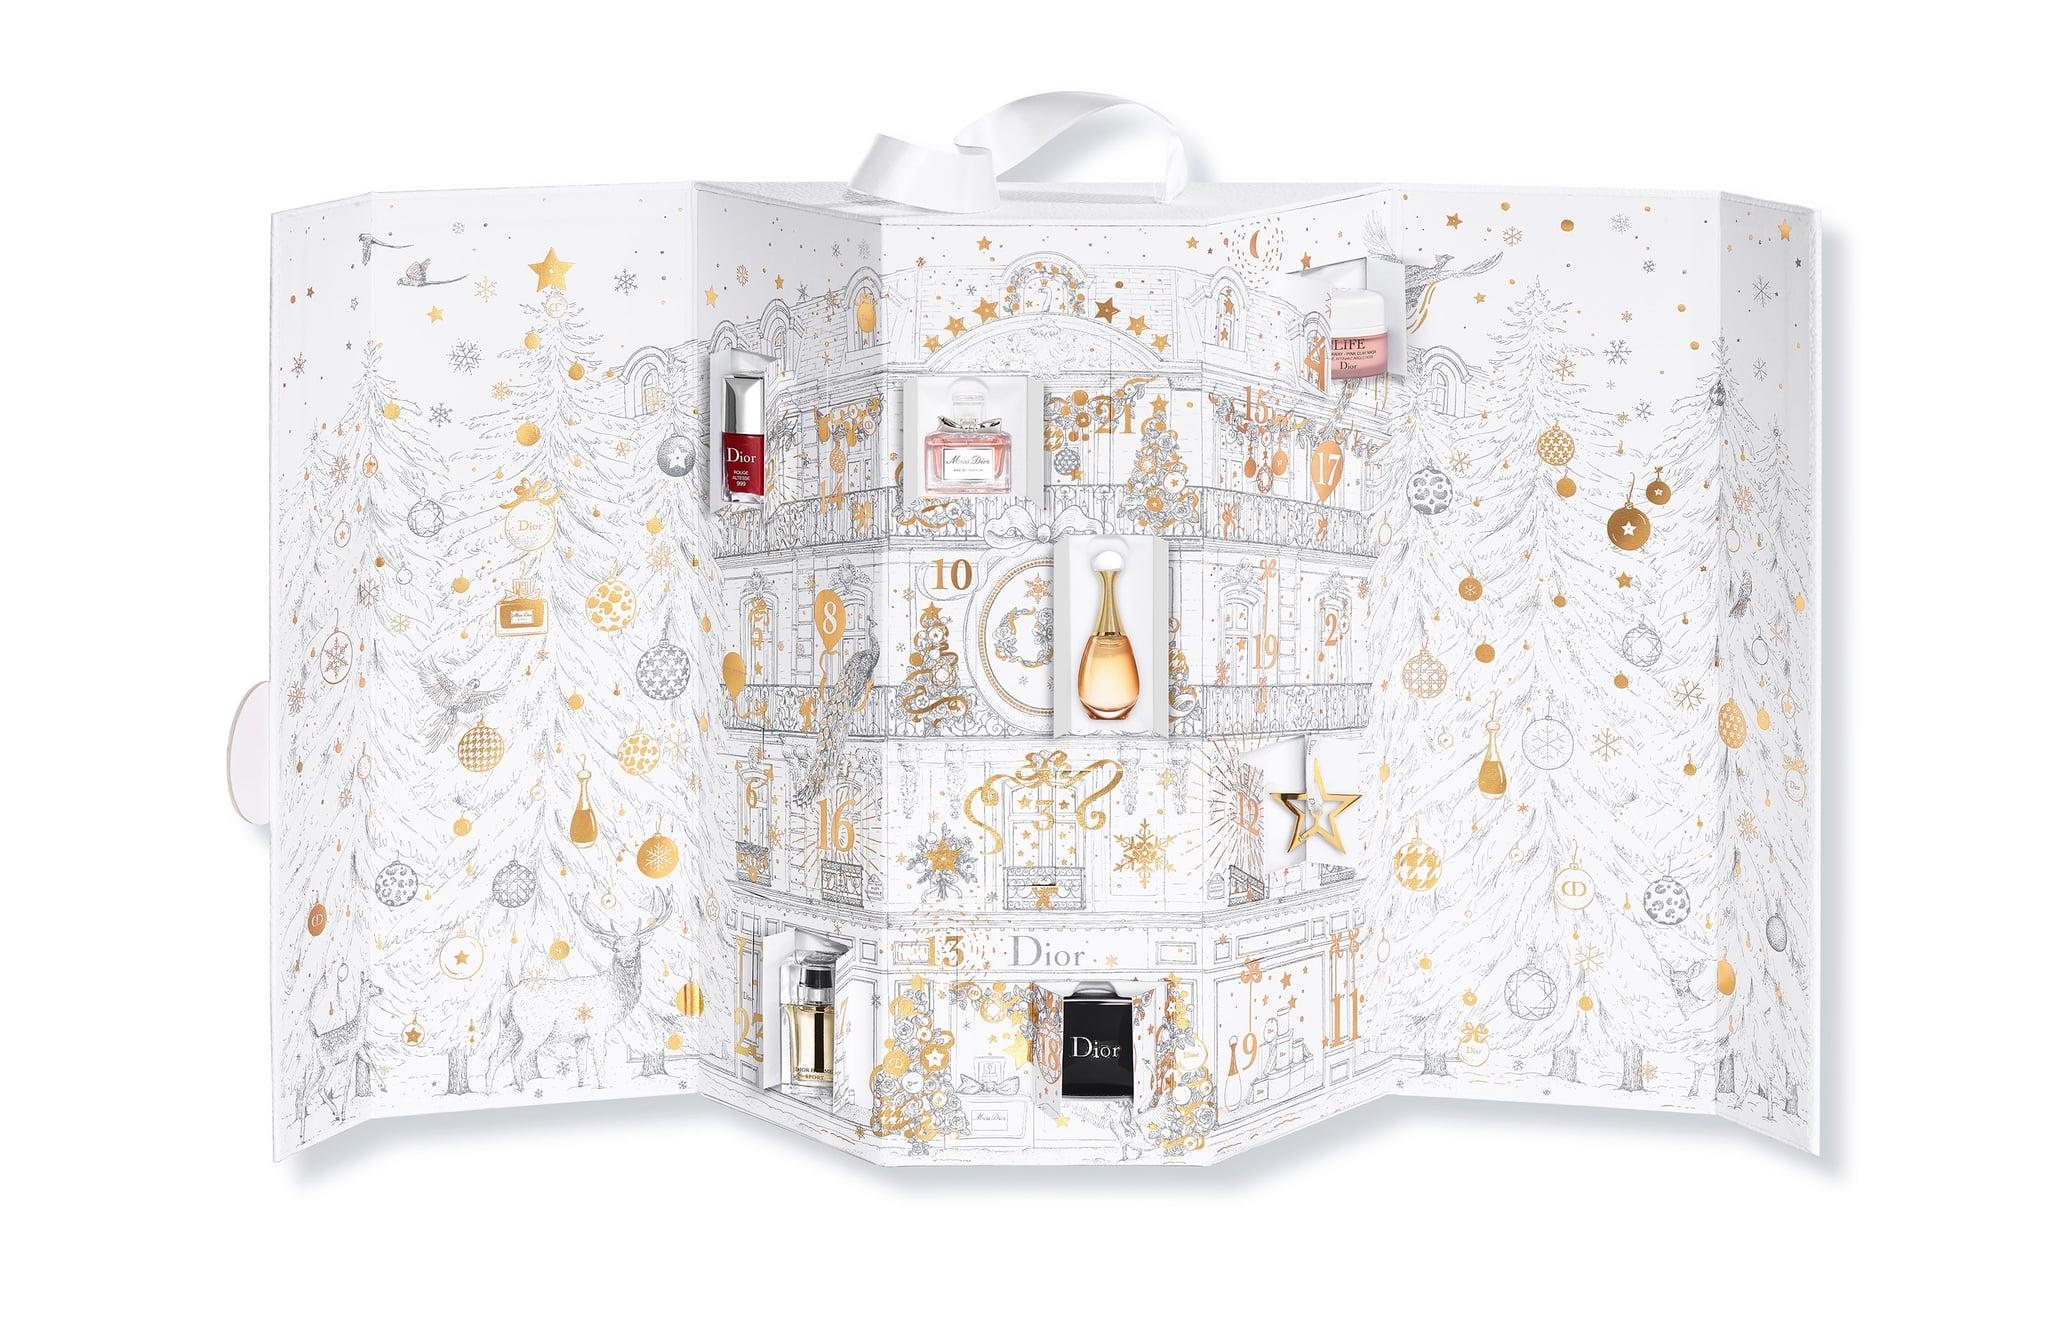 Luxury Advent Calendars For A Lavish Christmas luxury advent calendars Luxury Advent Calendars For A Lavish Christmas Dior Advent Calendar